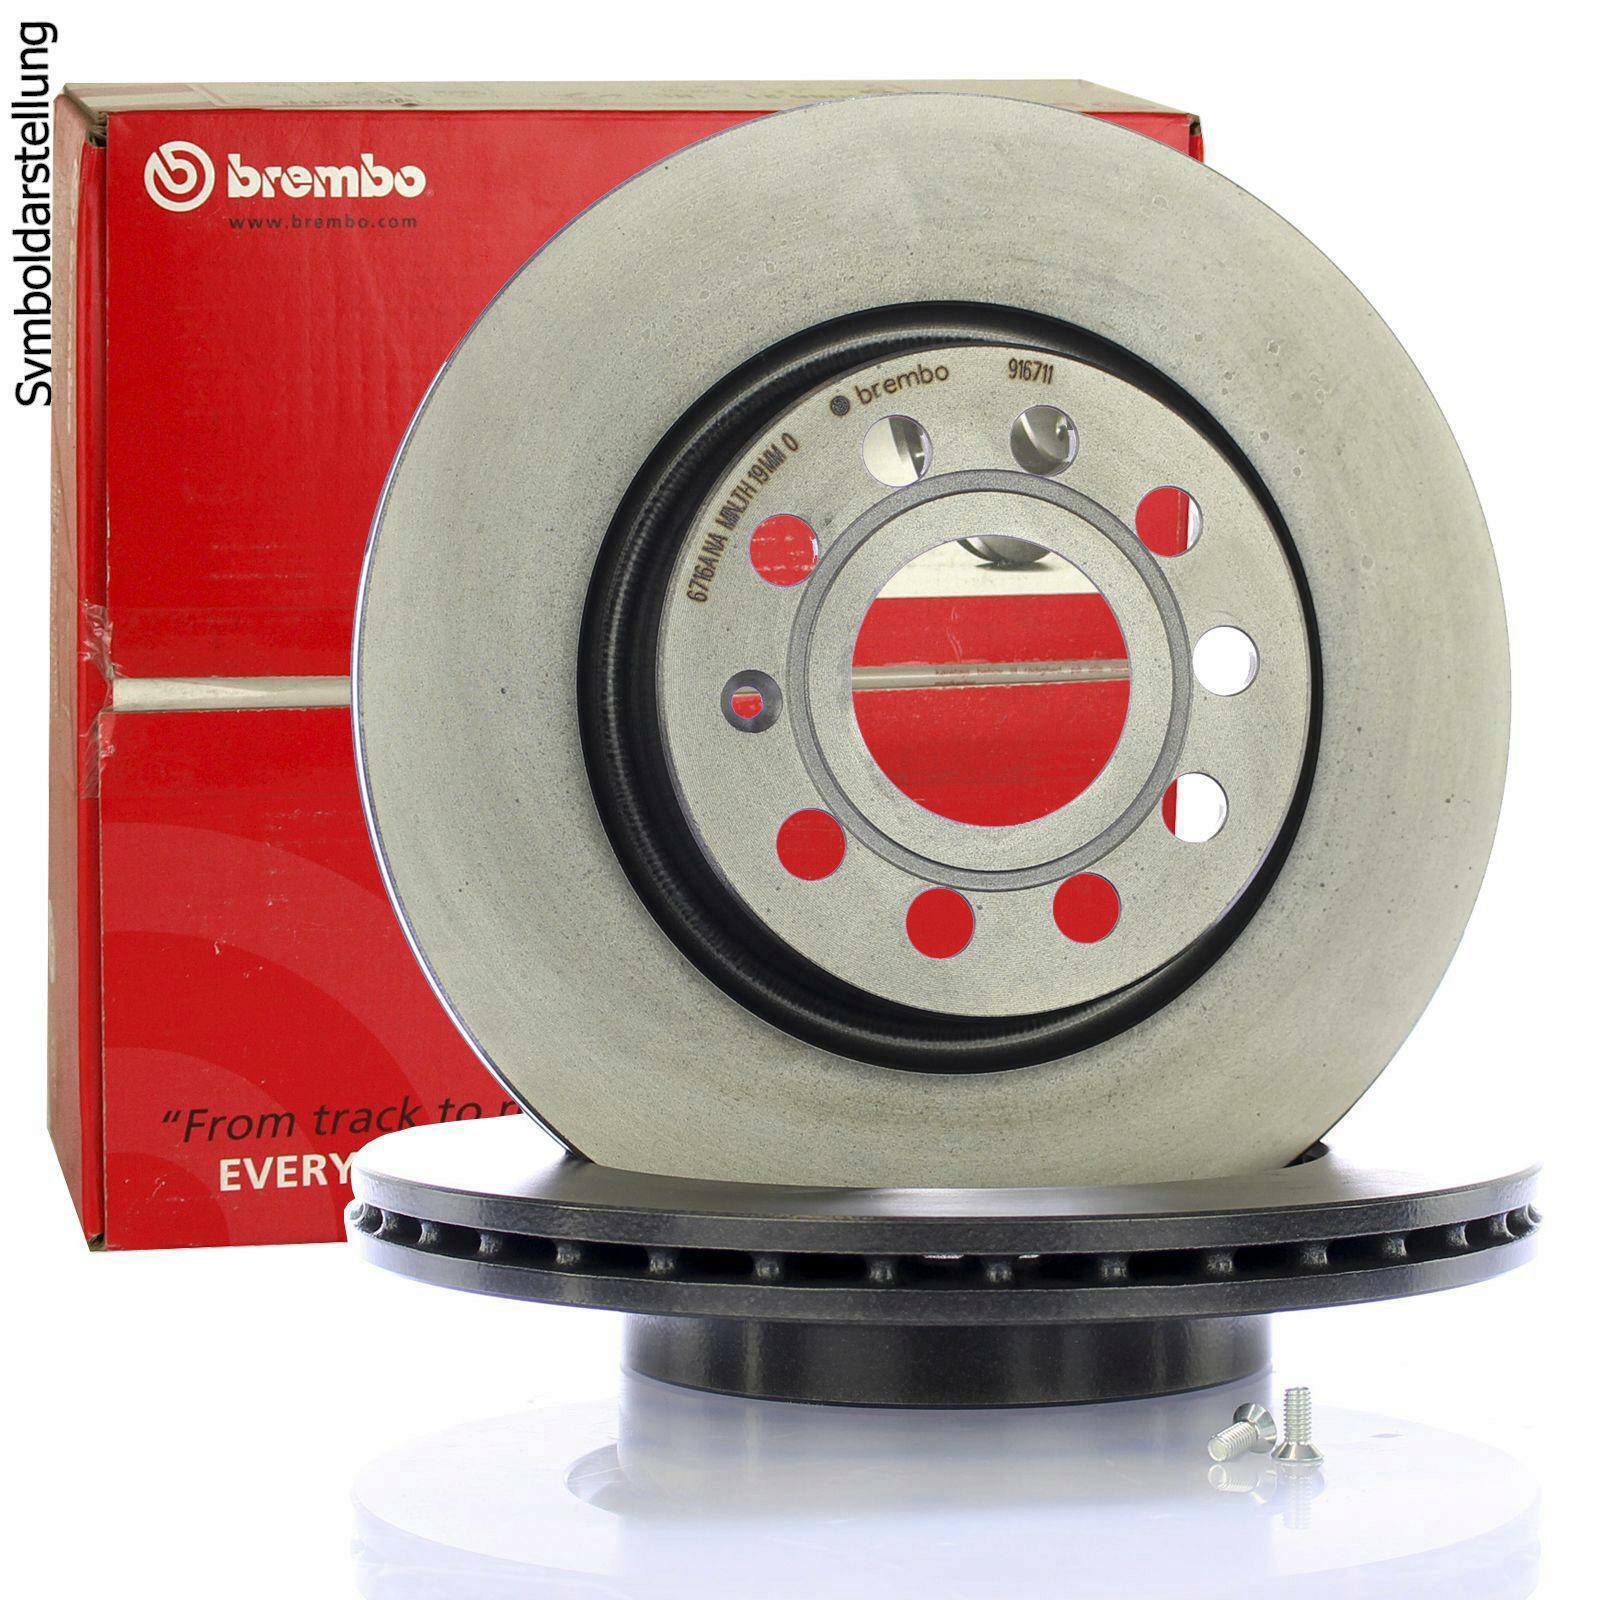 2x brembo bremsscheibe coated disc line lott autoteile. Black Bedroom Furniture Sets. Home Design Ideas